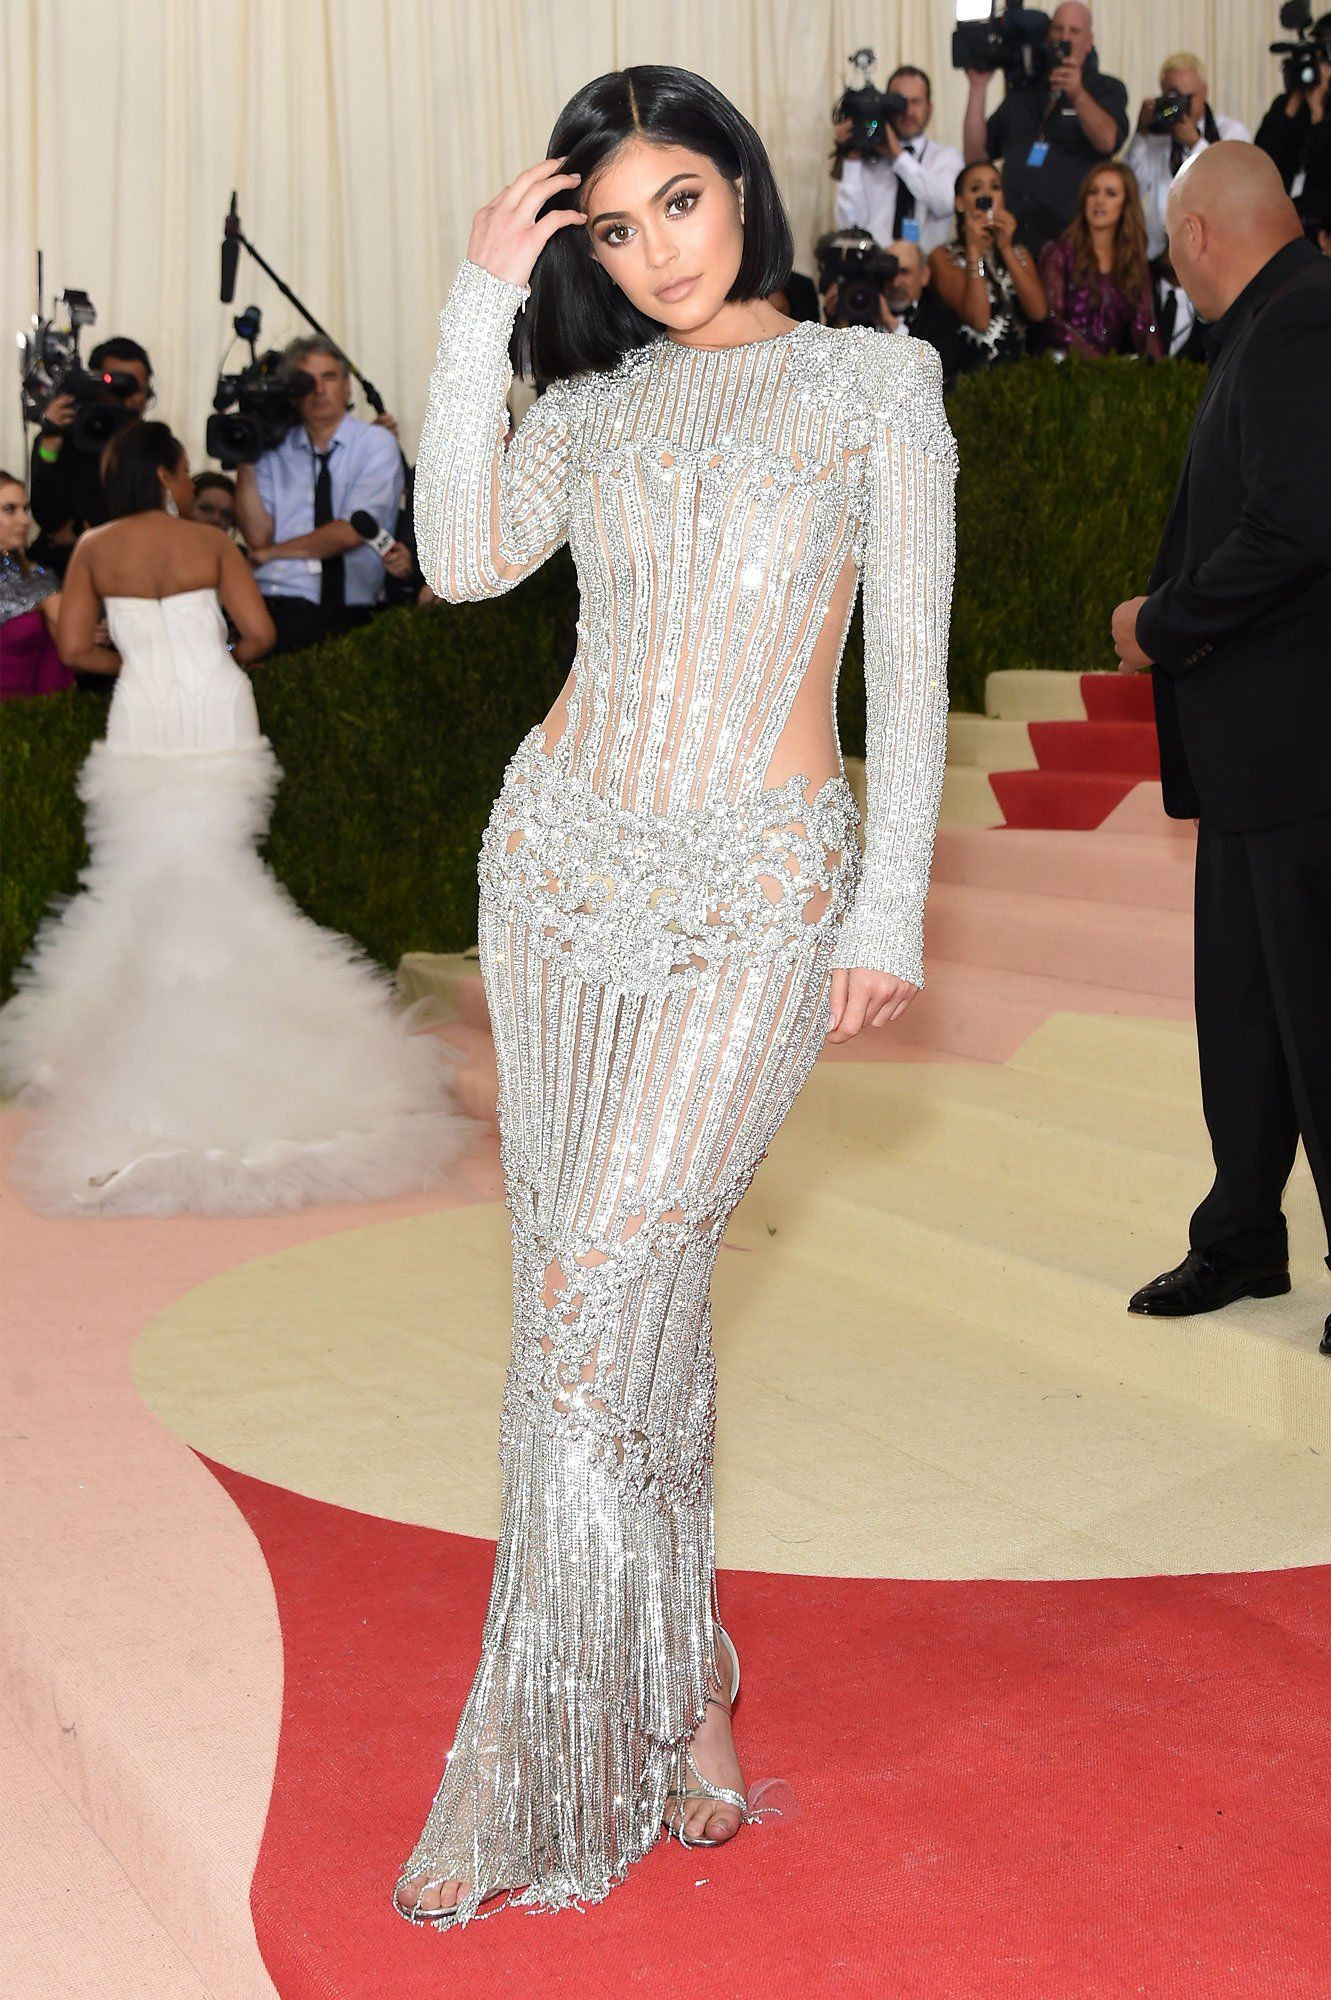 Kylie Jenner on Her First Met Gala | Pinterest | Met gala, Kylie and ...